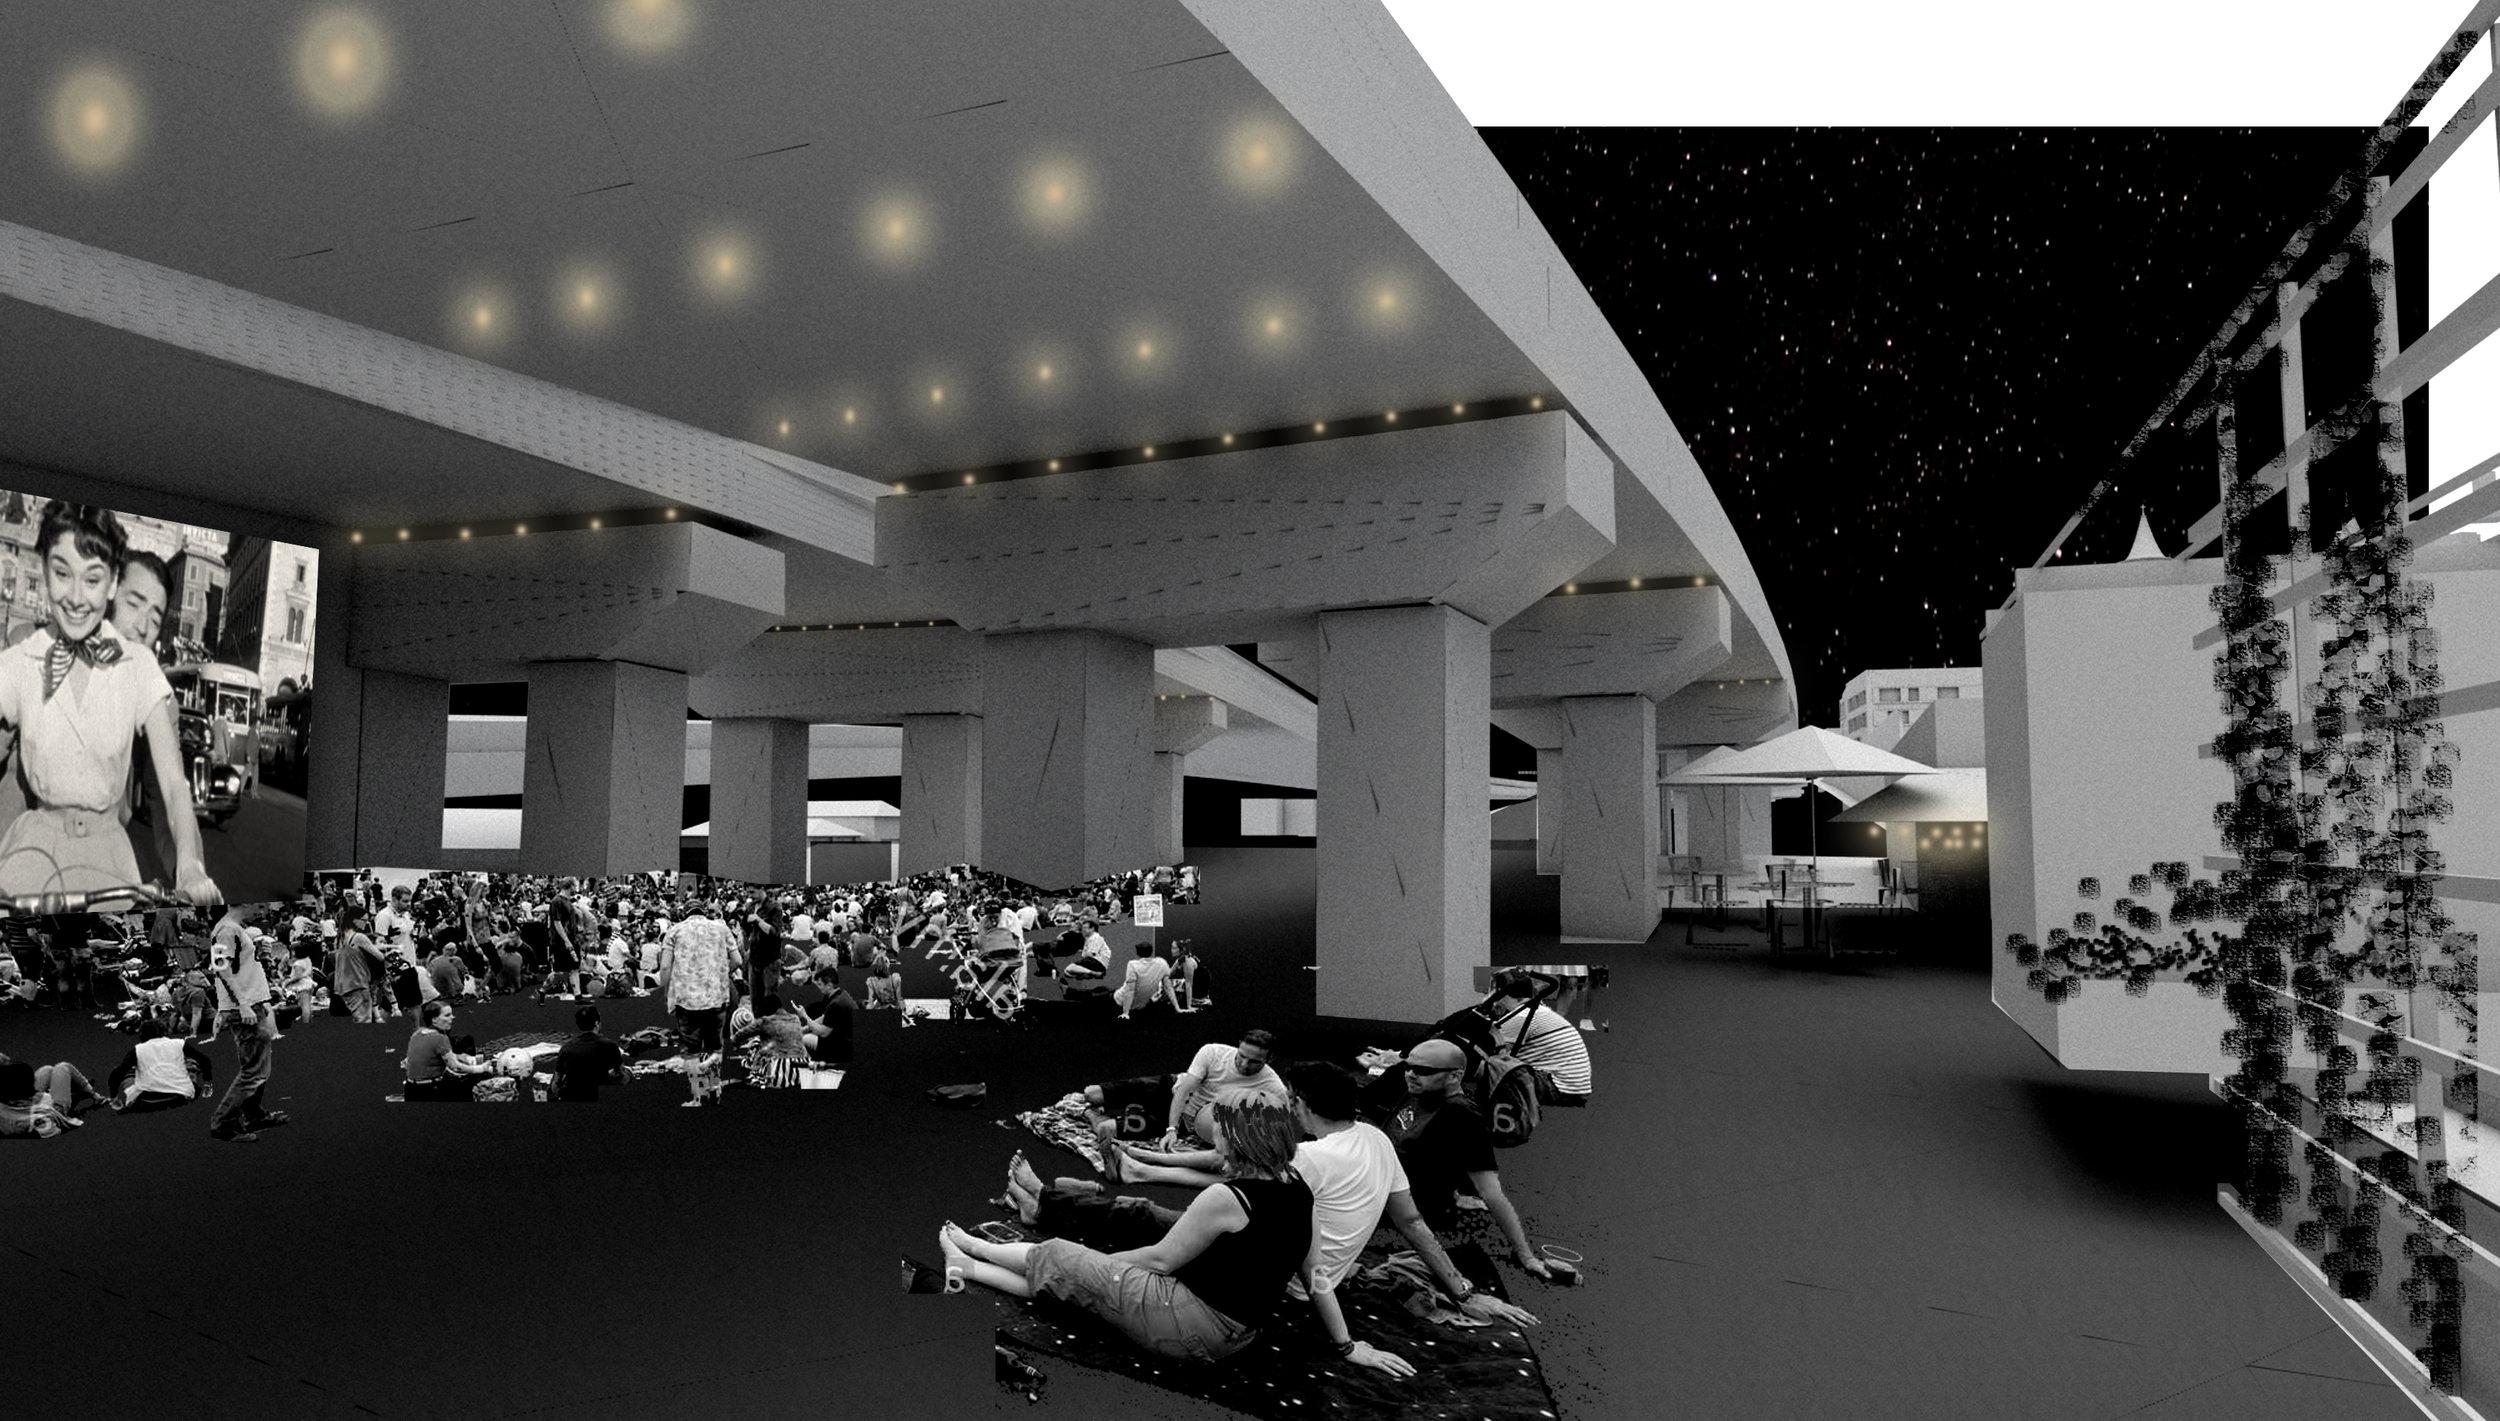 1204_render-highway theater-002.jpg